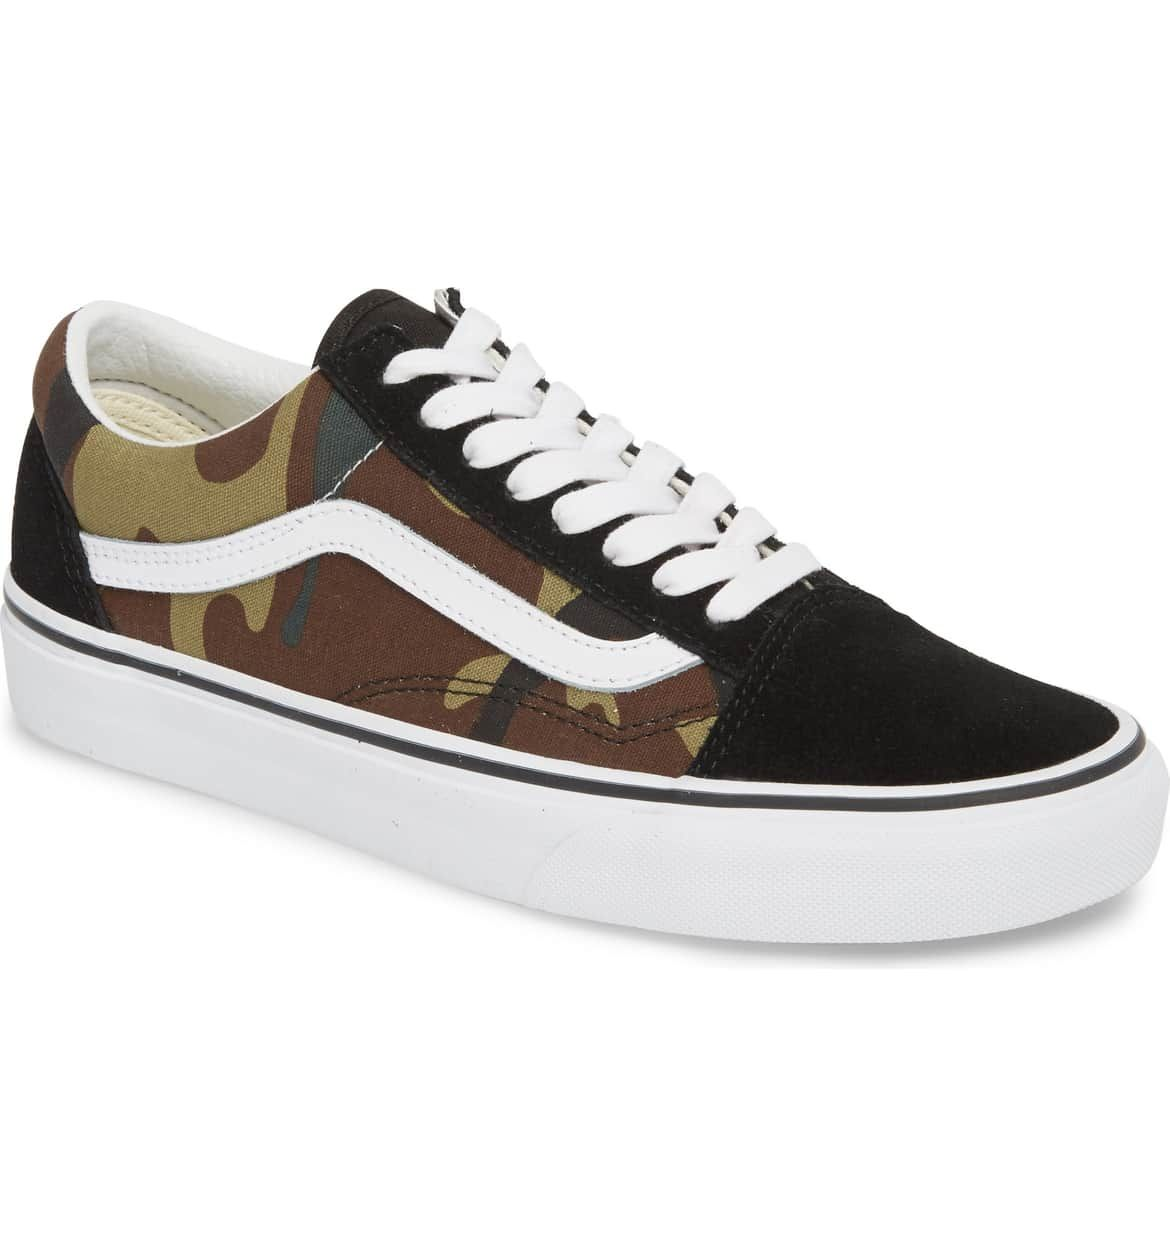 853662e36979 Old Skool Sneaker